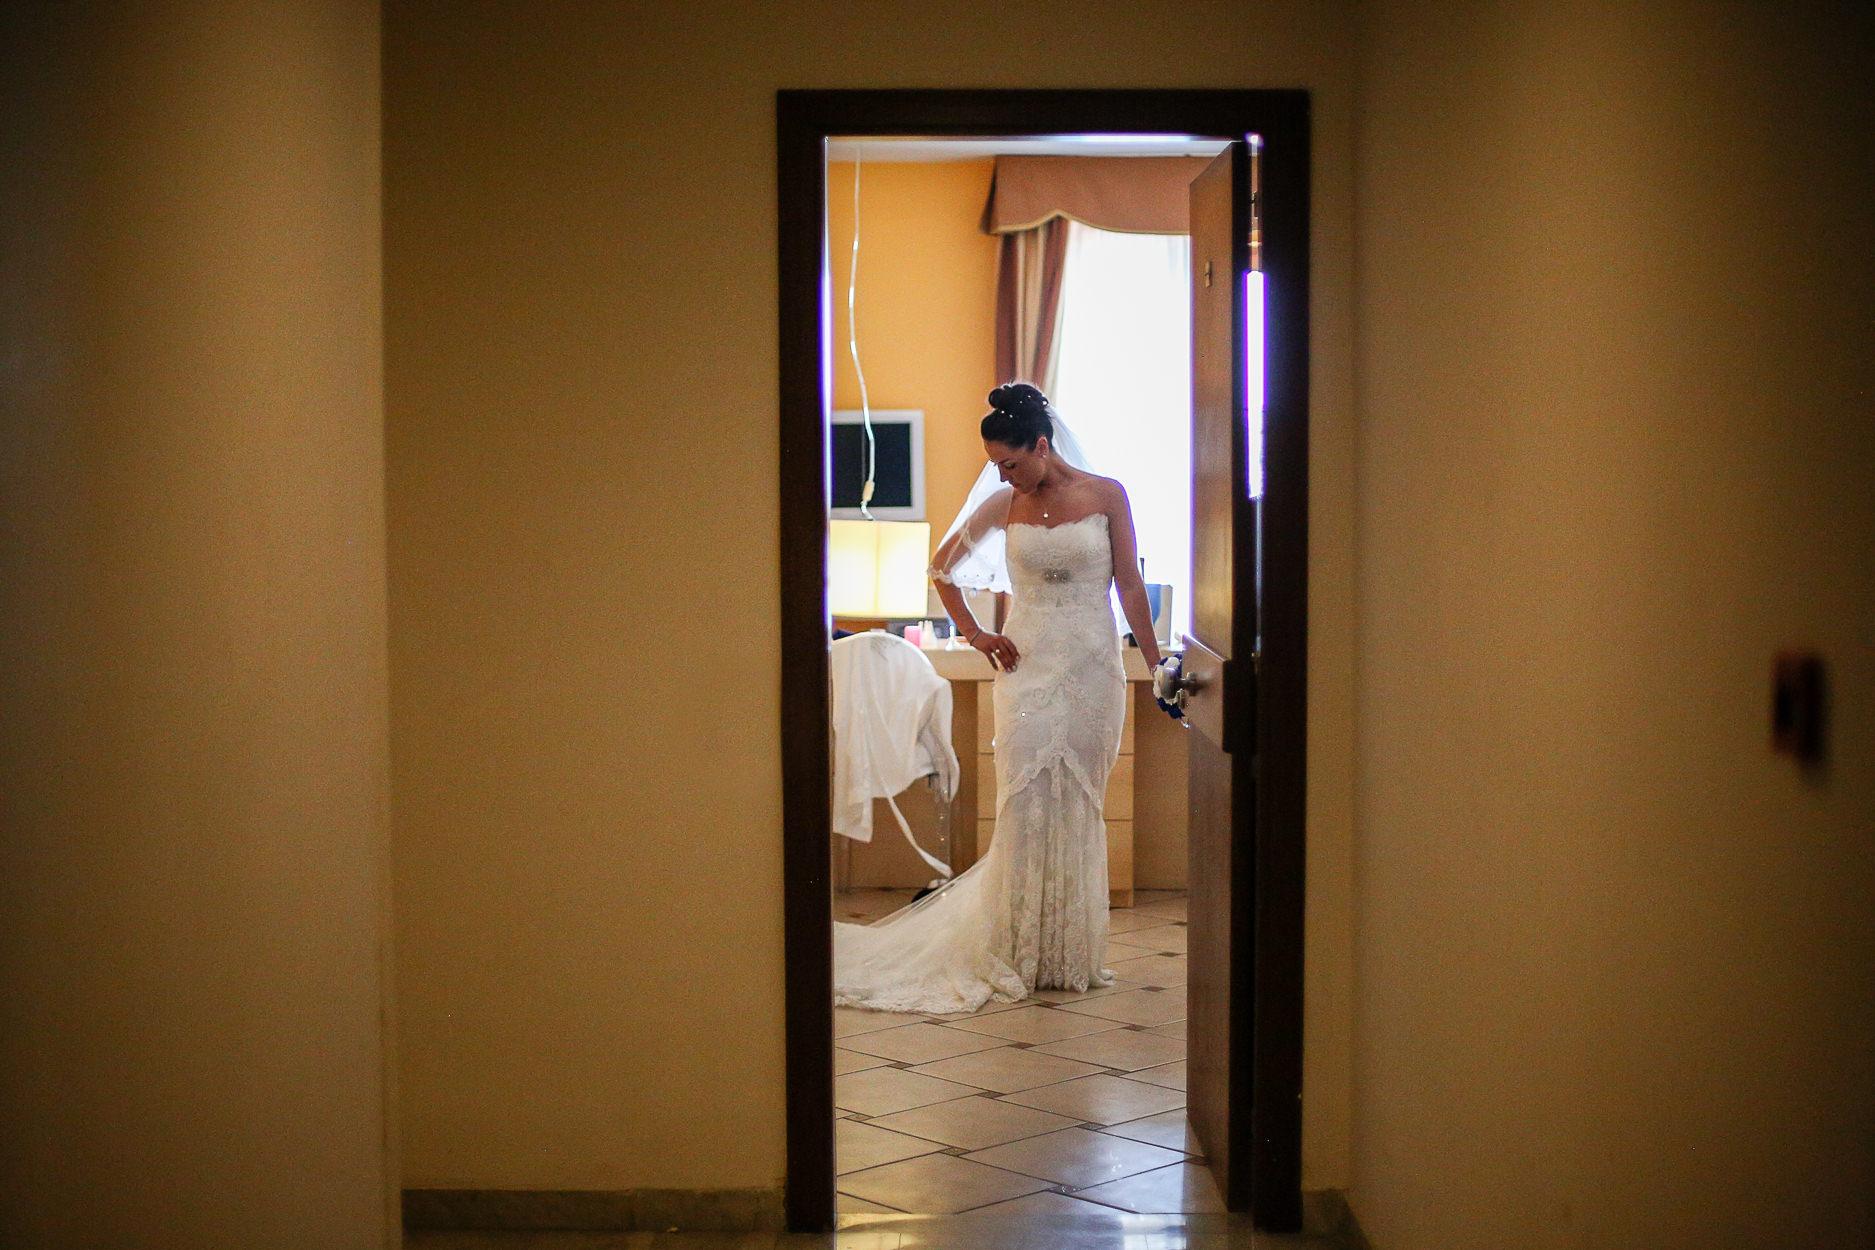 English-Wedding-Photographer-Sorrento- Rivage-Hotel-Pridal-Preparations-Pronovias-Wedding-Dress-17